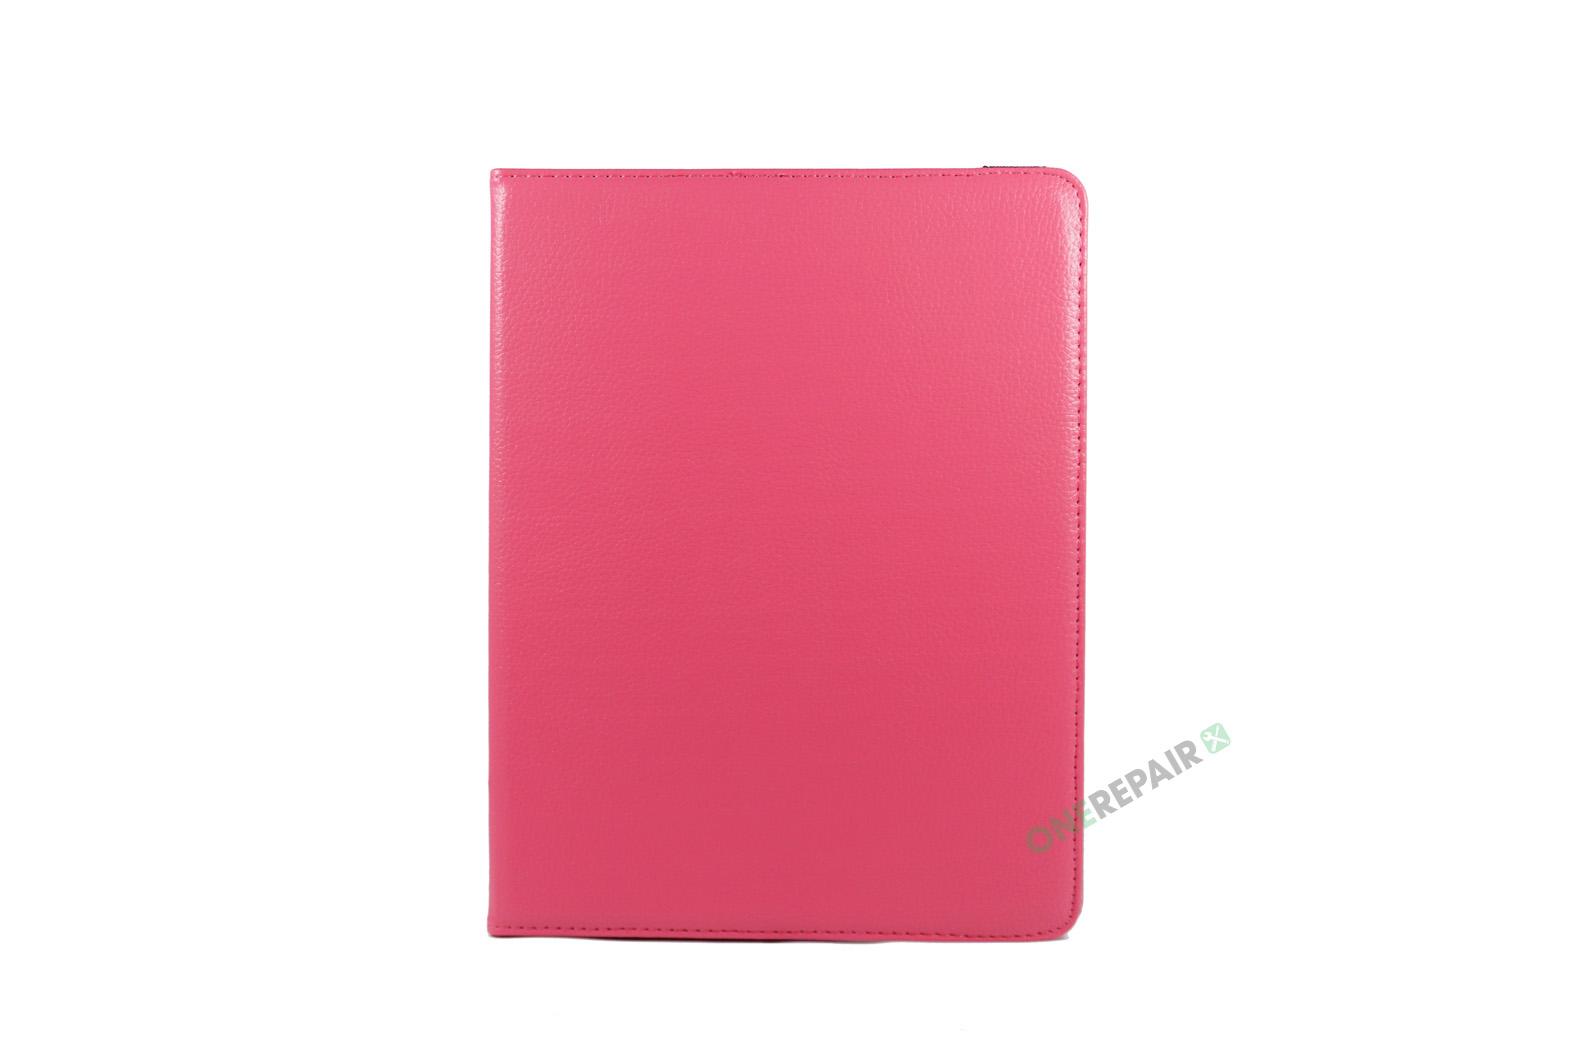 351032_iPad_2_3_4_A1395_A1396_A1430_A1403_1458_A1459_A1460_A1397_Flipcover_Classic_360_Cover_Lyseroed_Pink_Billig_Godt_Beskyttelse_OneRepair_WM_00002